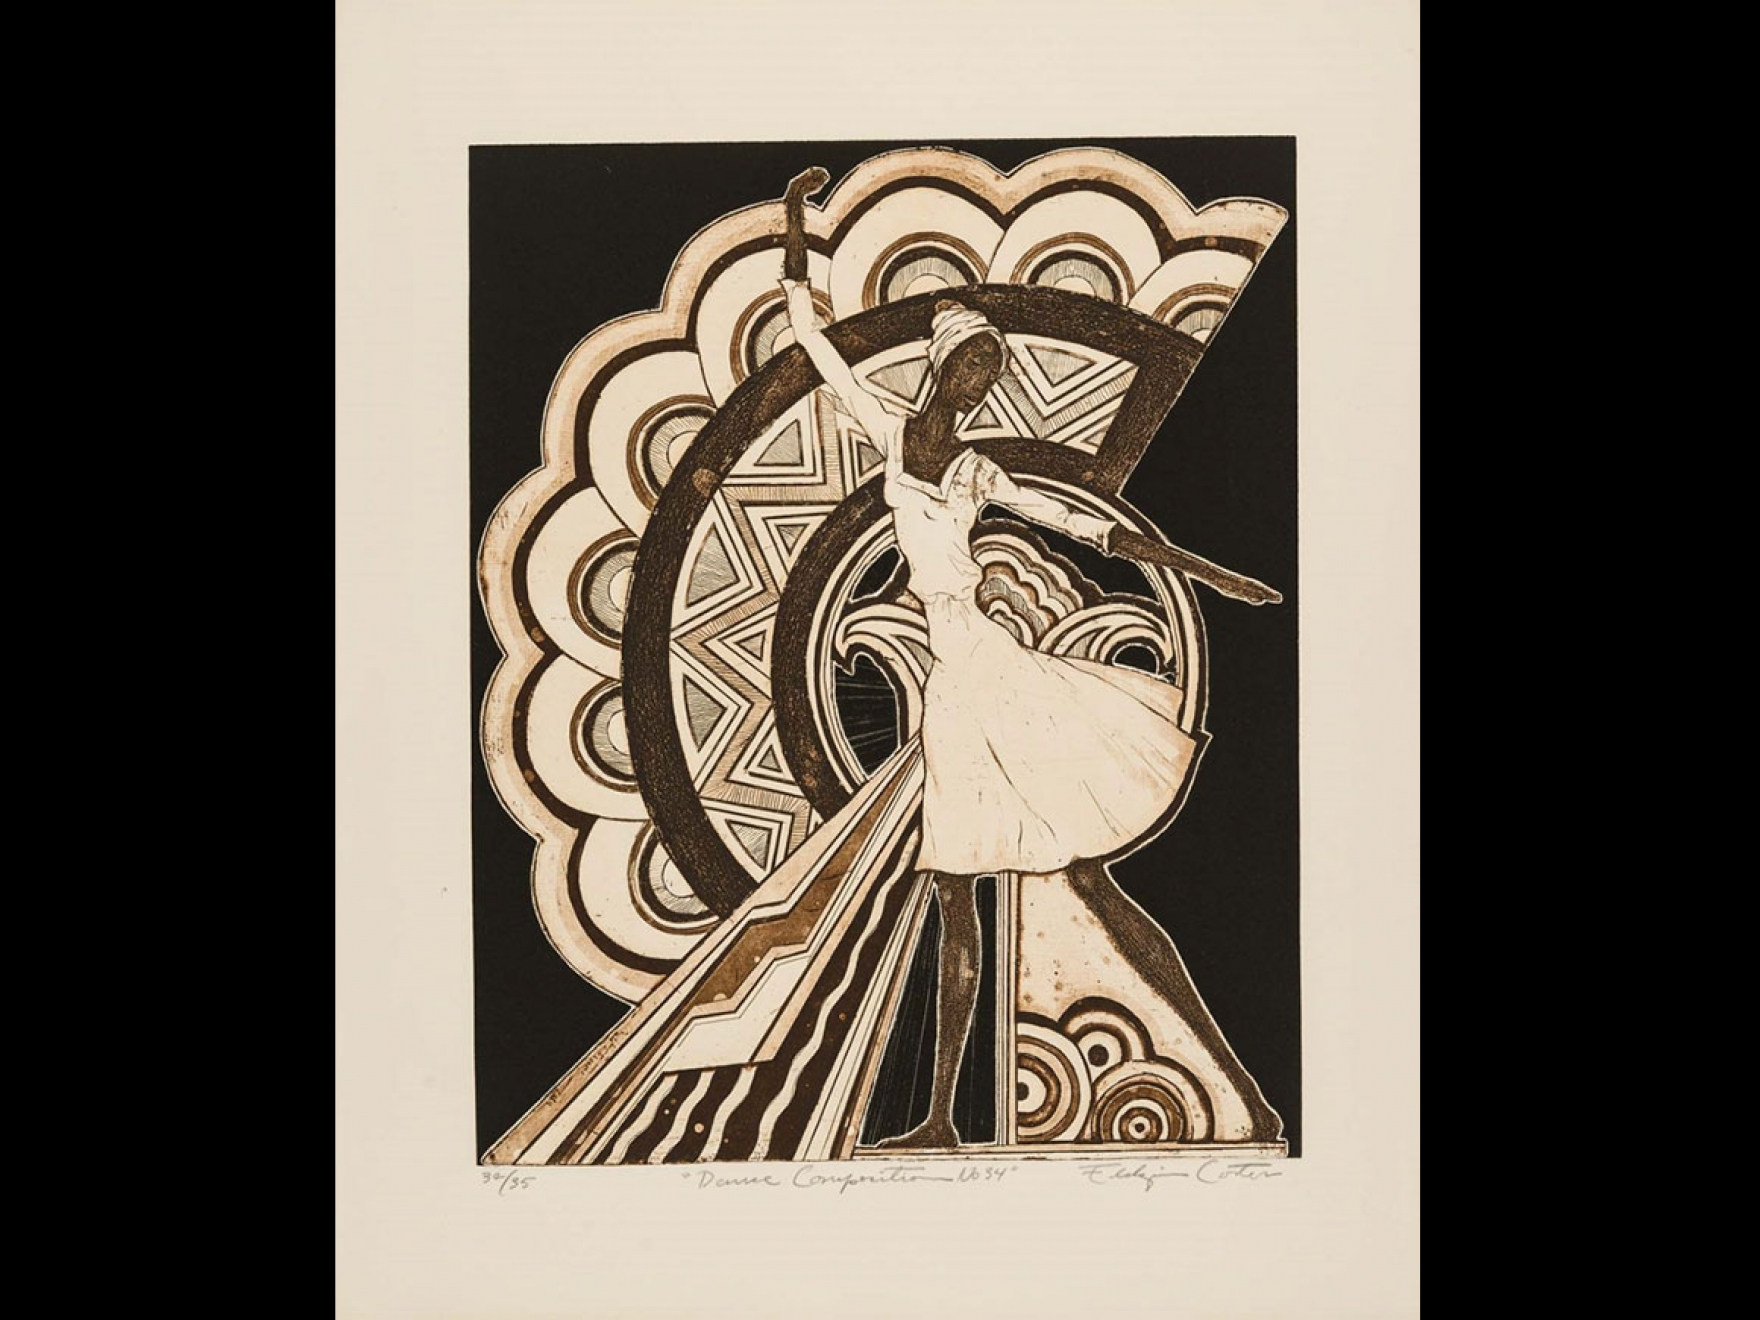 Eldzier Cortor's print, Dance Composition No. 34